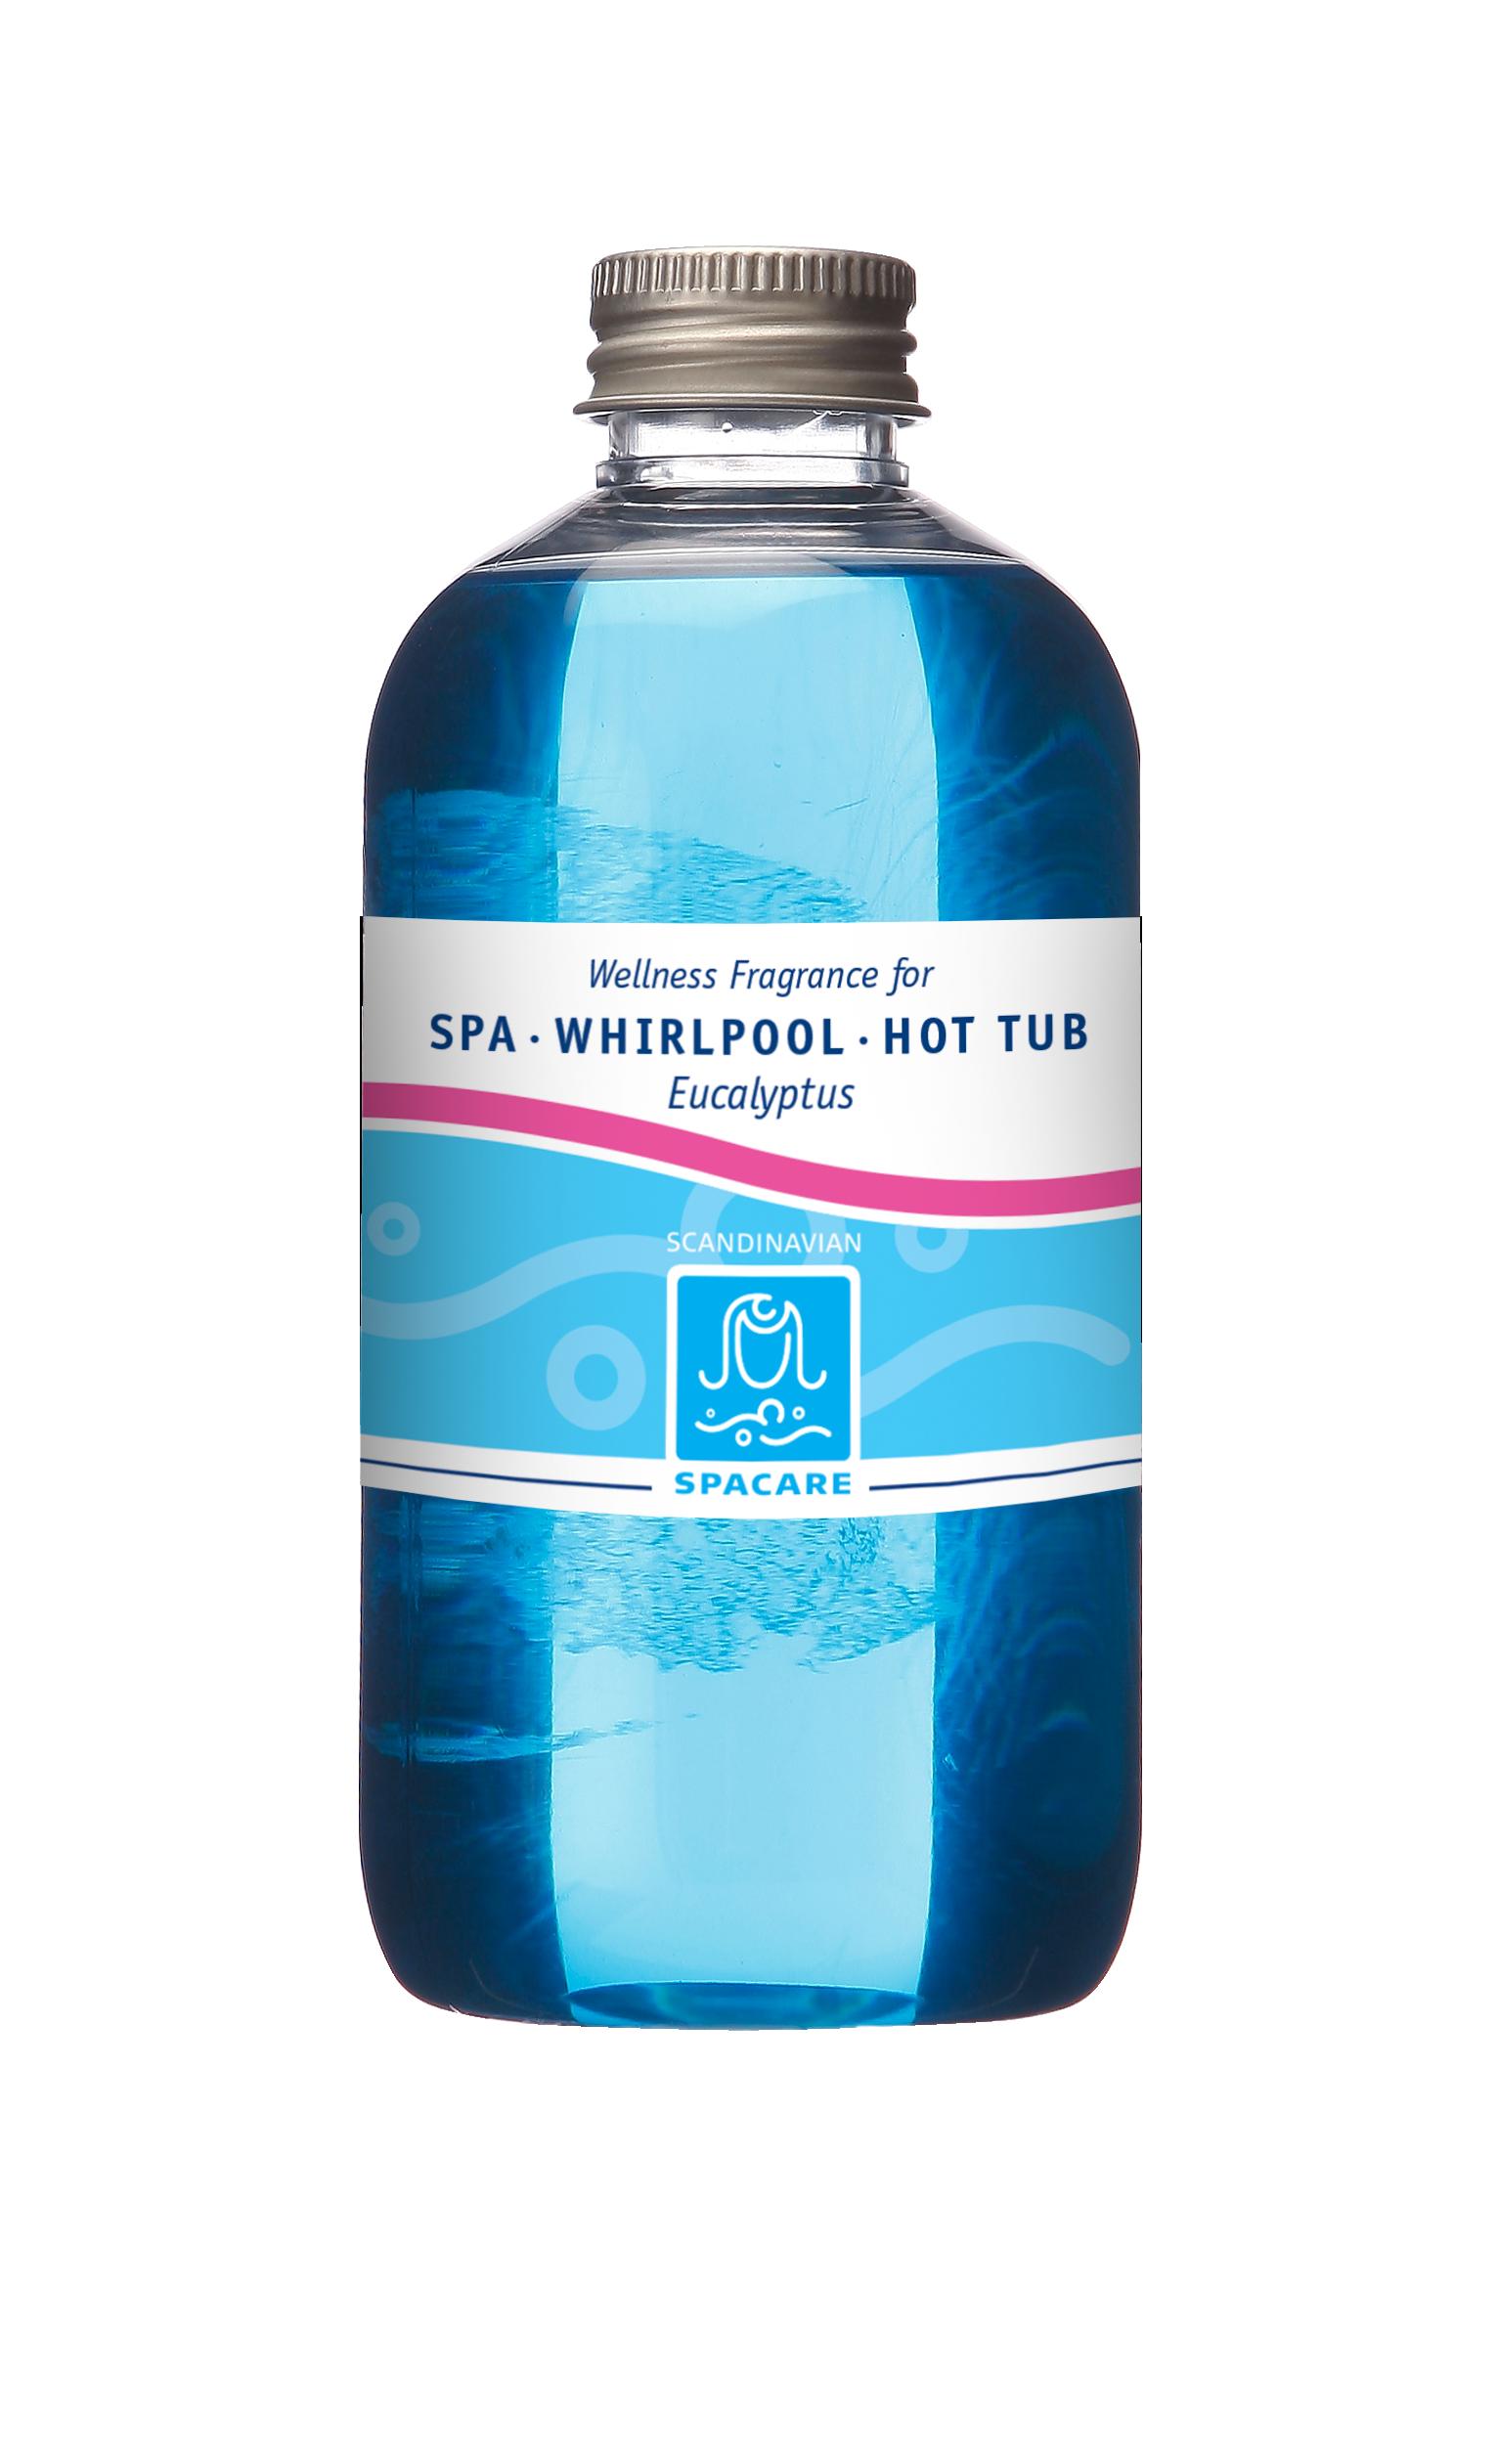 SpaCare Wellness Fragrance Eucalyptus